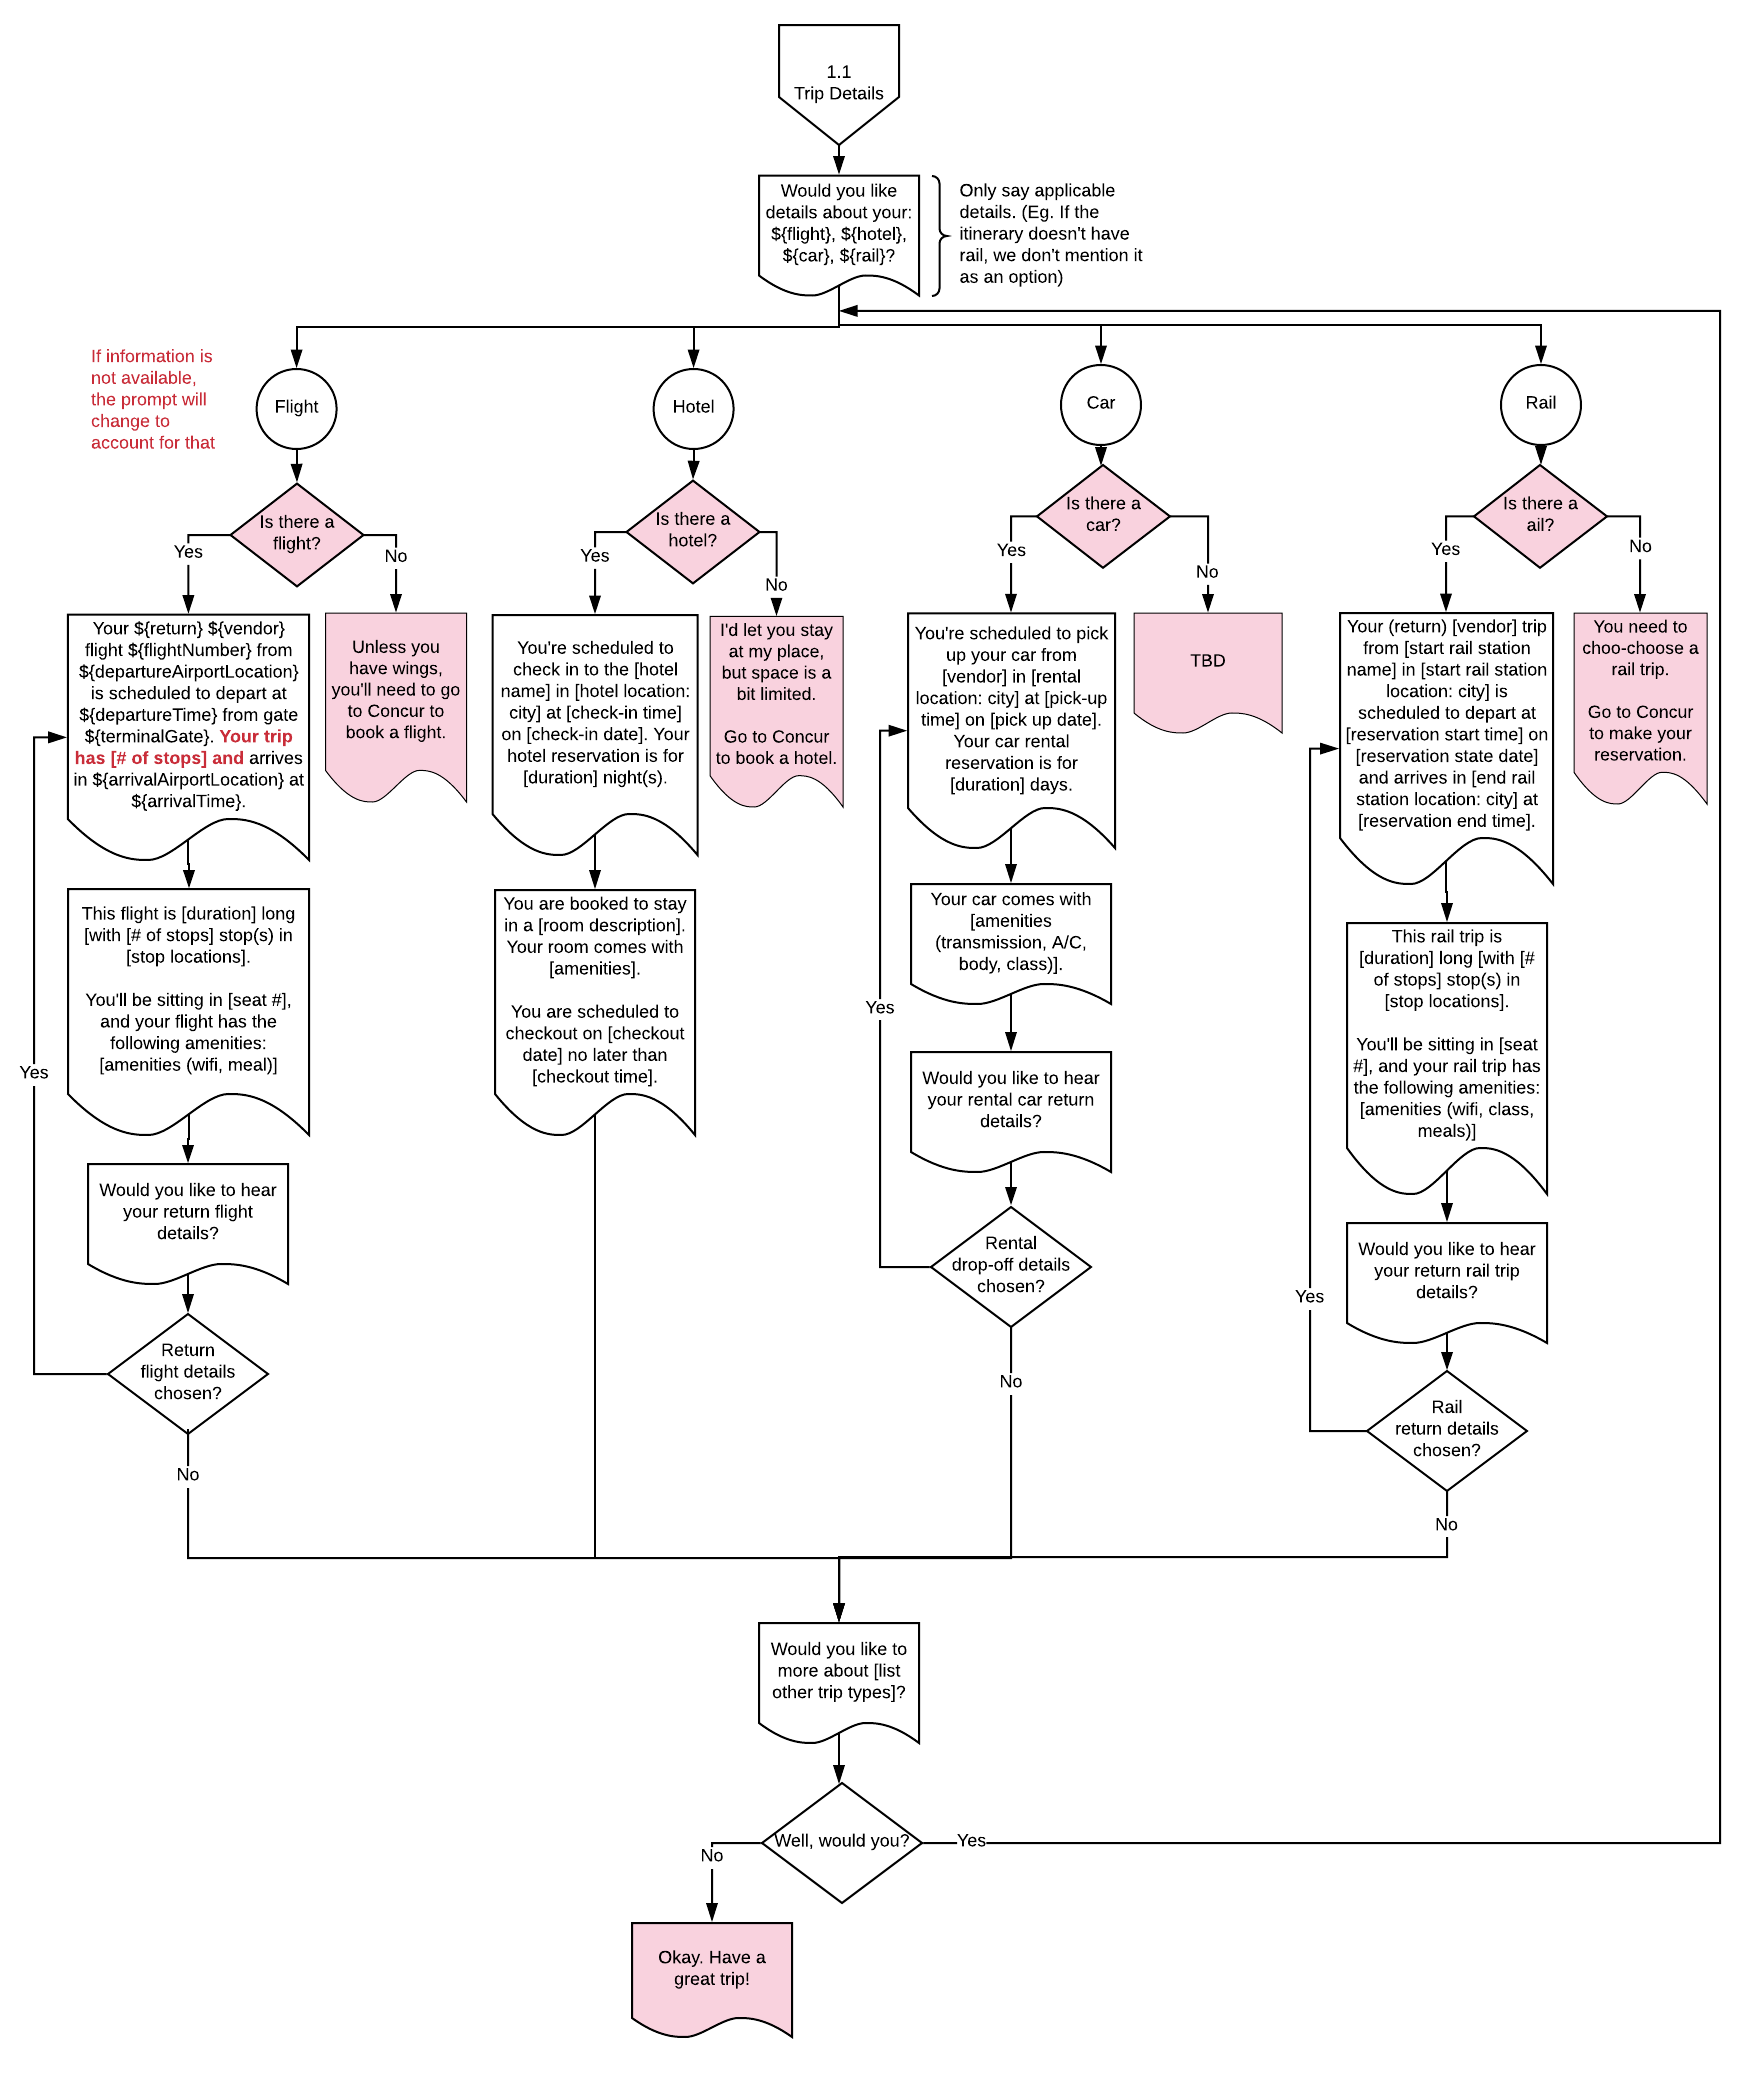 1.1 Trip Details User Flow